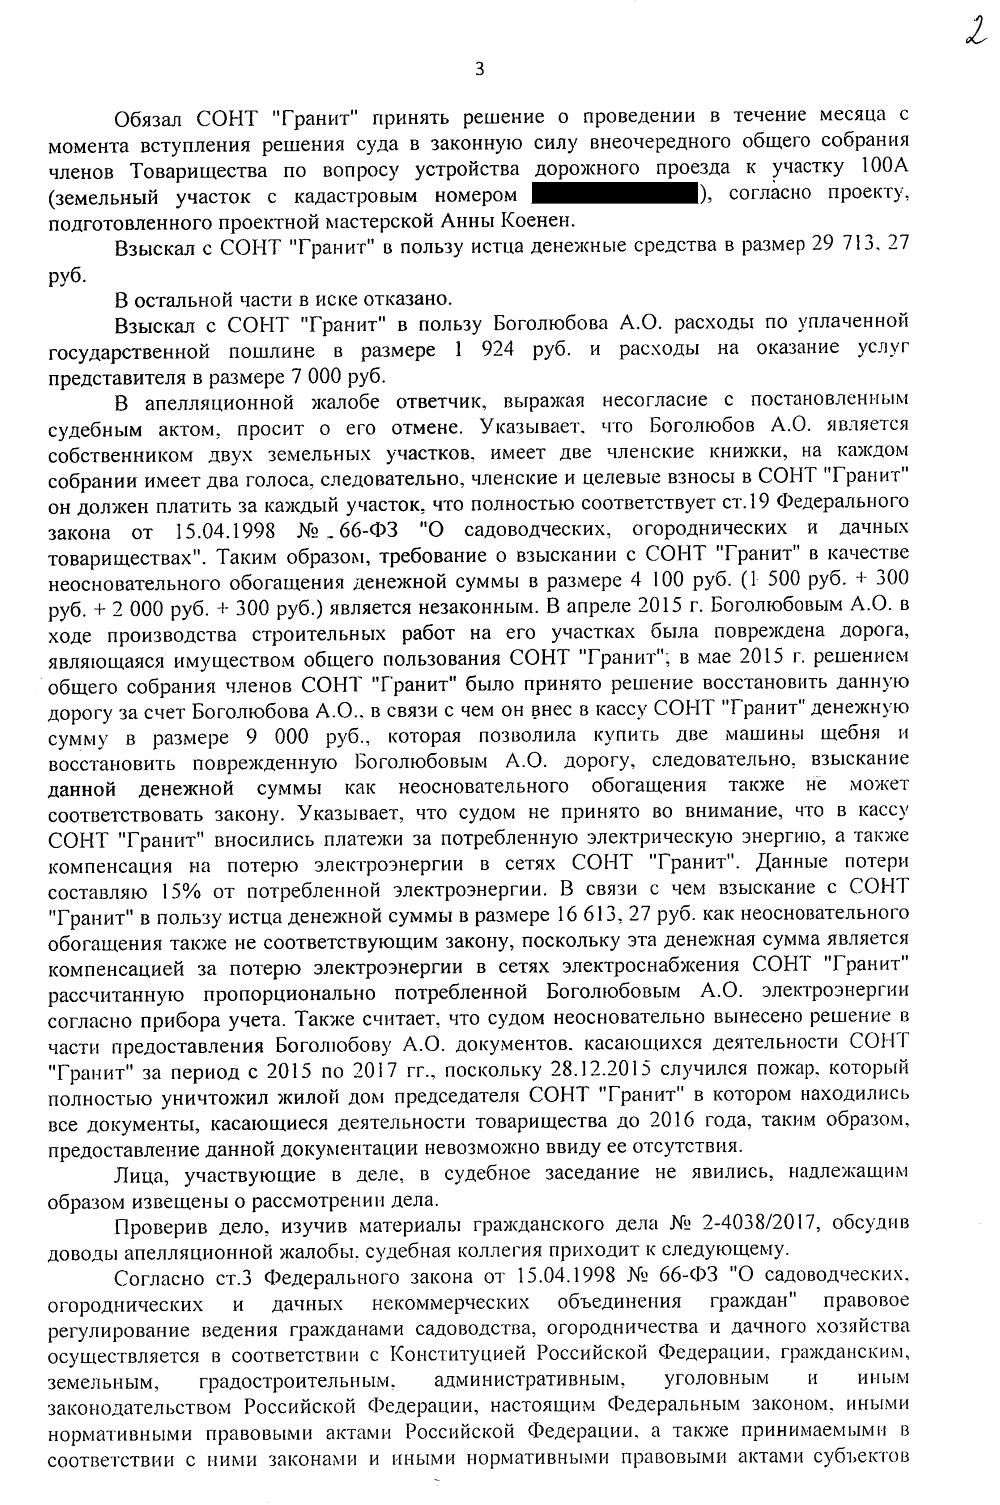 https://sontgranit.ru/forum/img/sokol/20180123-апелляционное-определение-вс-4.png